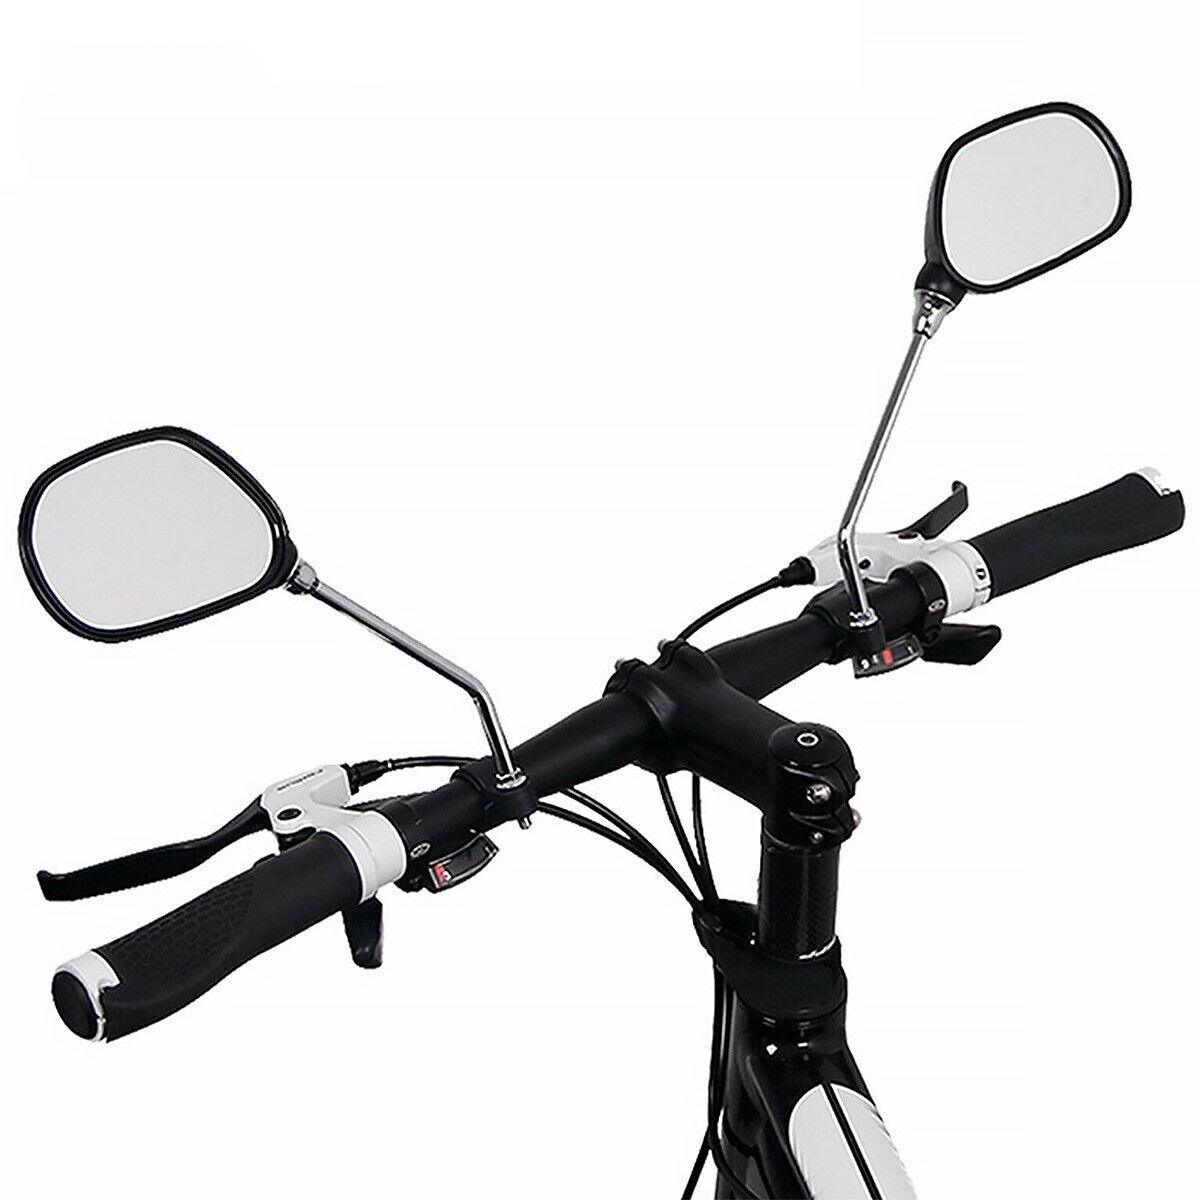 2 Stück Fahrrad Rückspiegel eBike Spiegel Fahrradlenker E-Bike Set Links Rechts